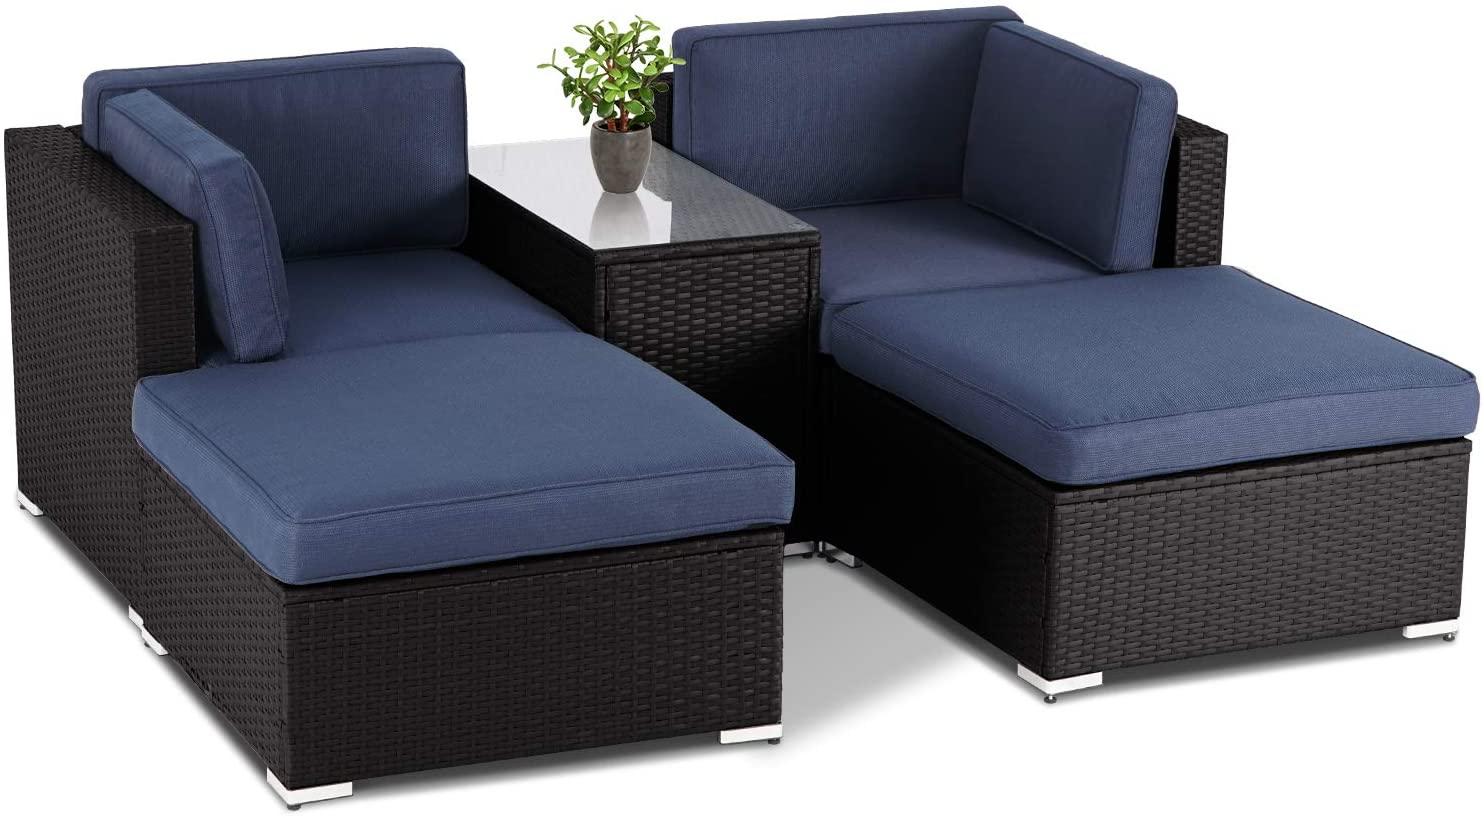 suncrown 5 piece outdoor patio lounge chair ottoman furniture set brown wicker sofa and glass coffee table dark blue cushion